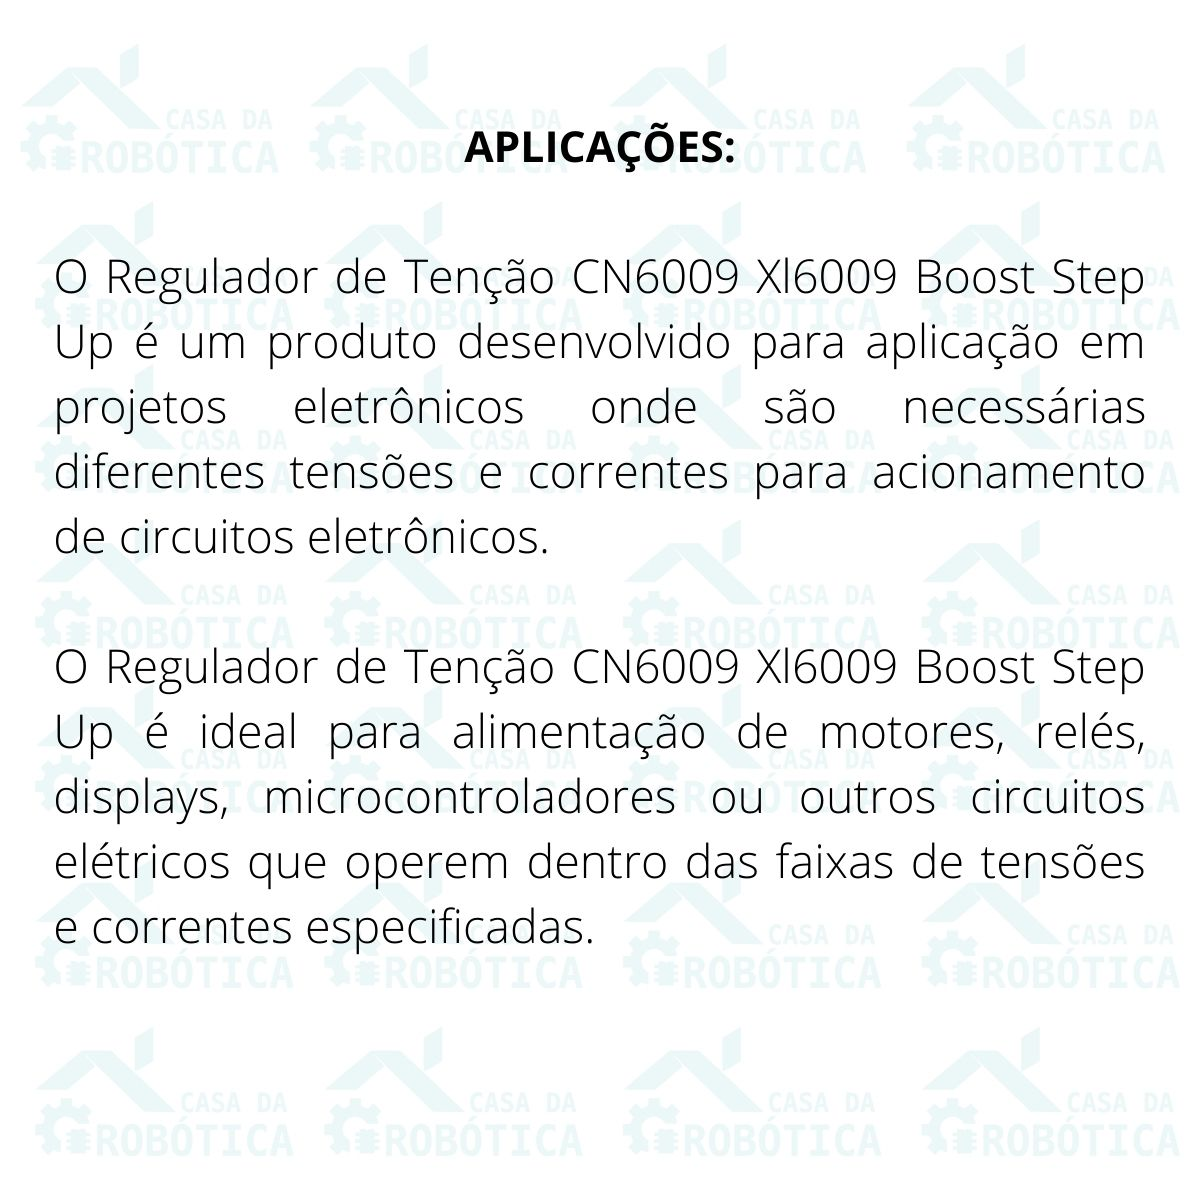 Conversor Regulador de Tensão DC DC Cn6009 Xl6009 Boost Step Up